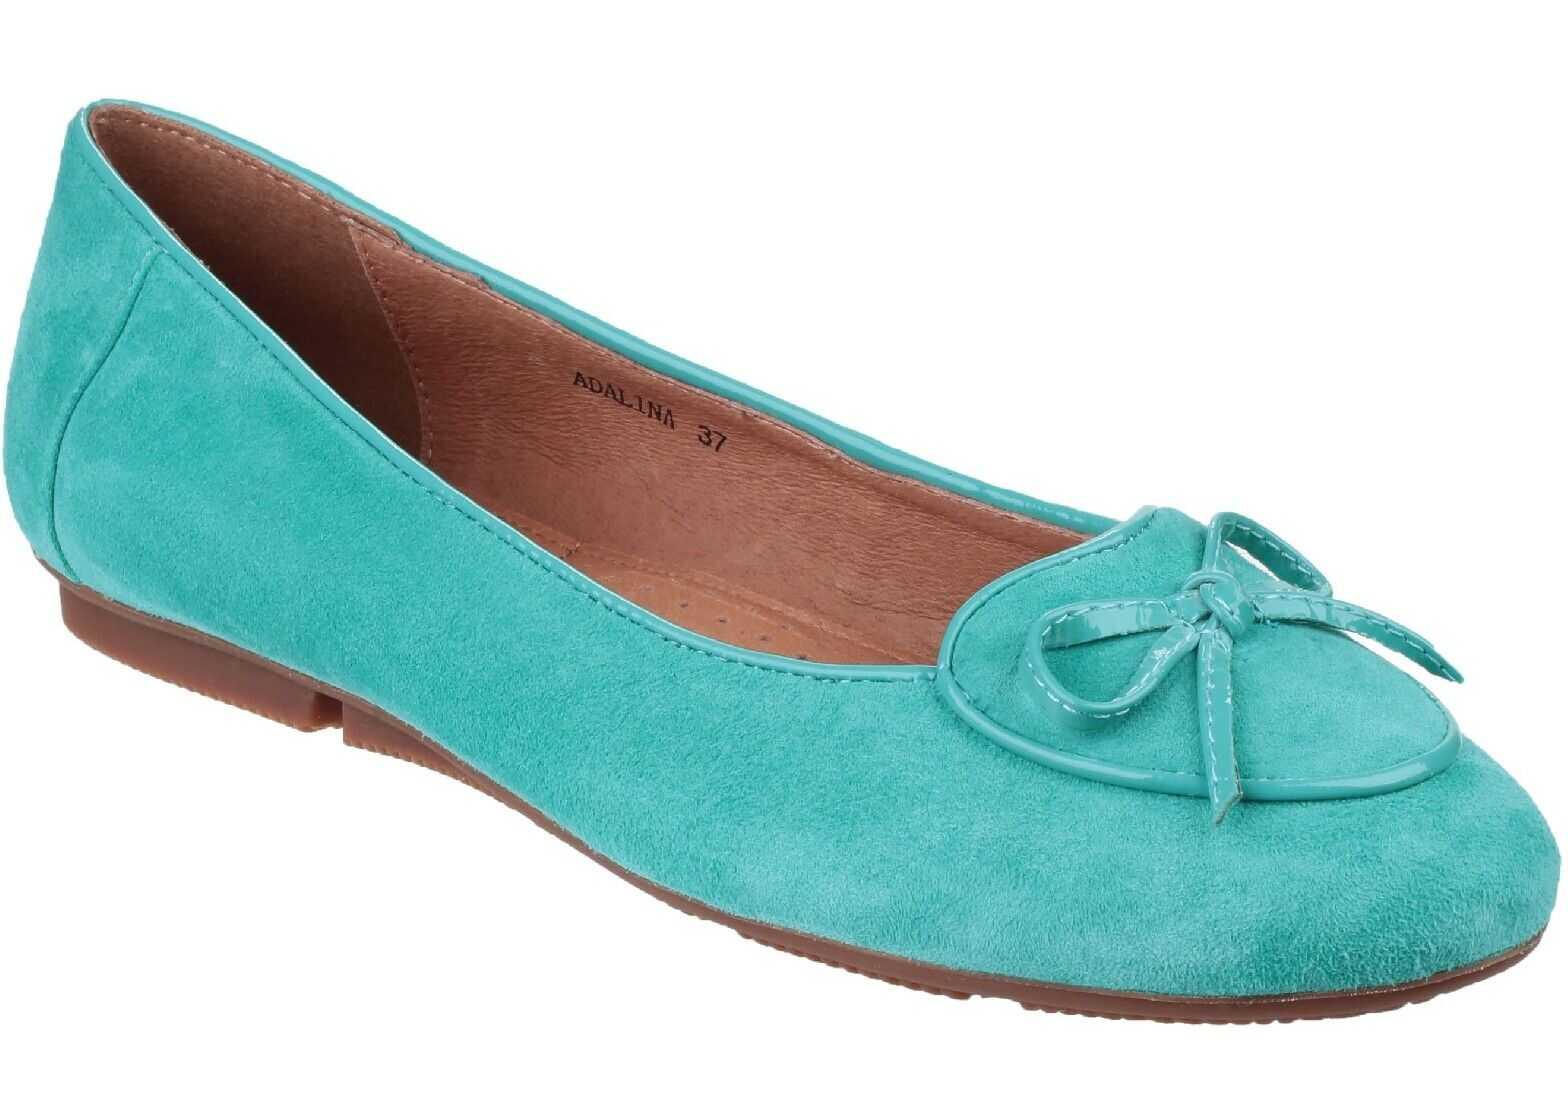 Riva Adalina Slip on Pump* Turquoise